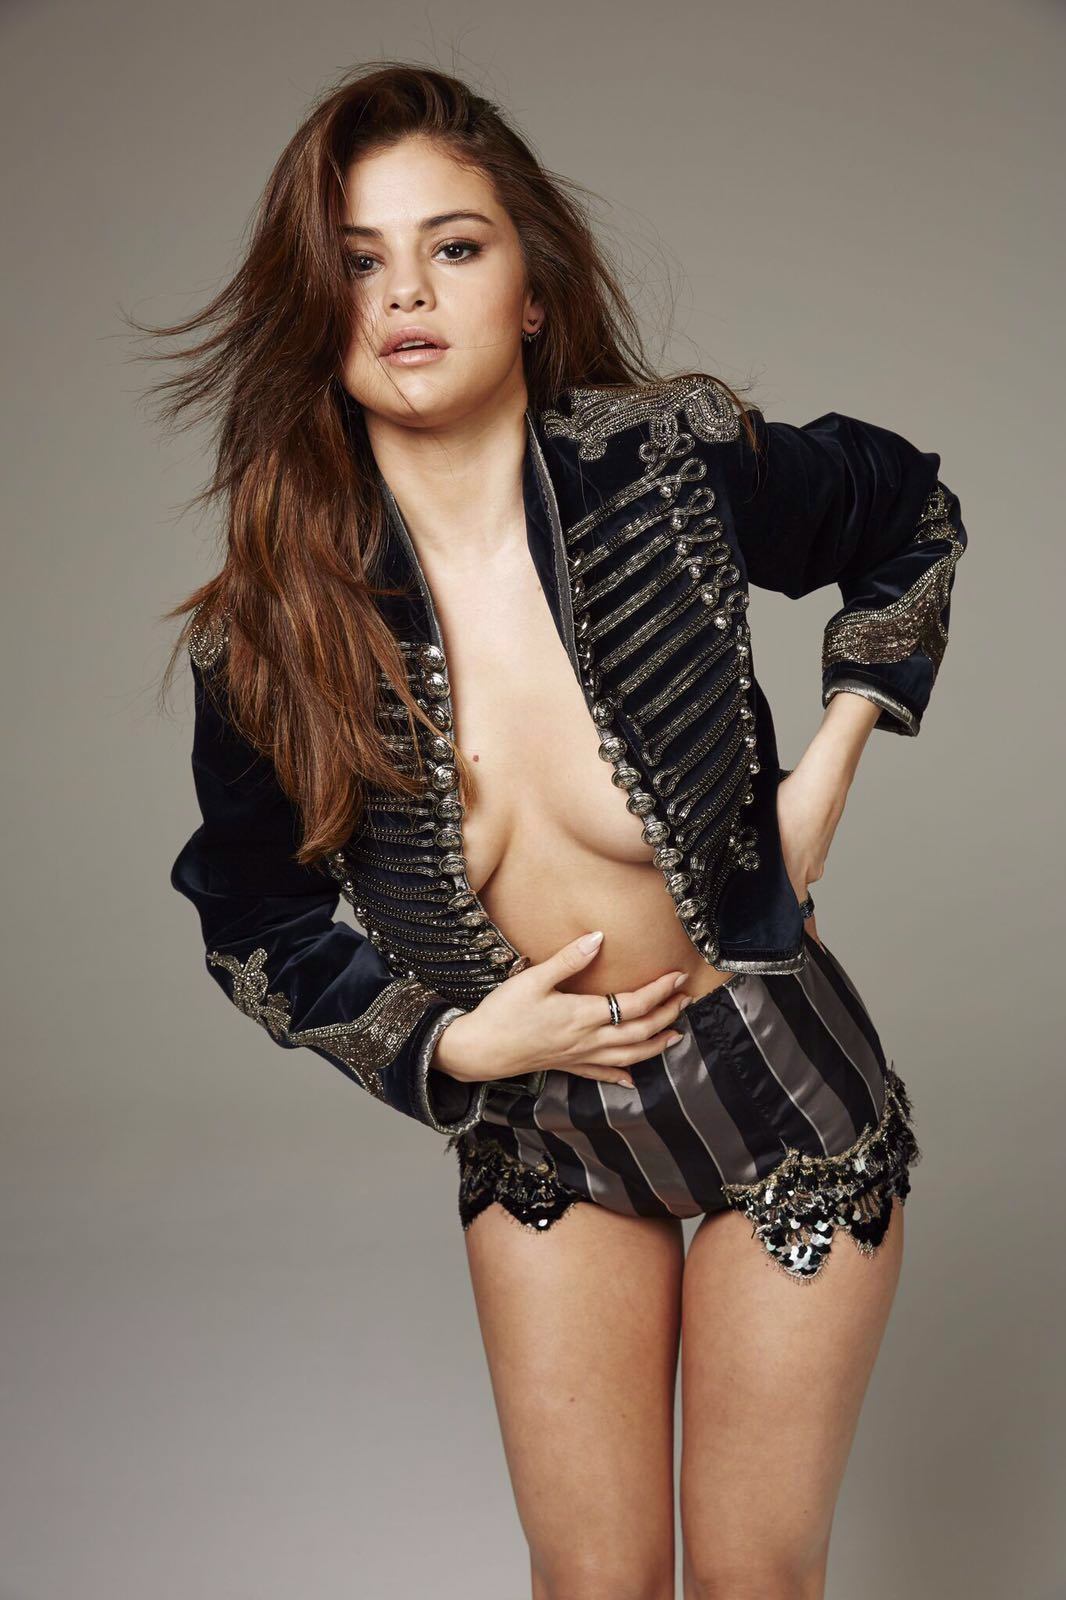 Selena gomez instyle magazine photoshoot june 2013